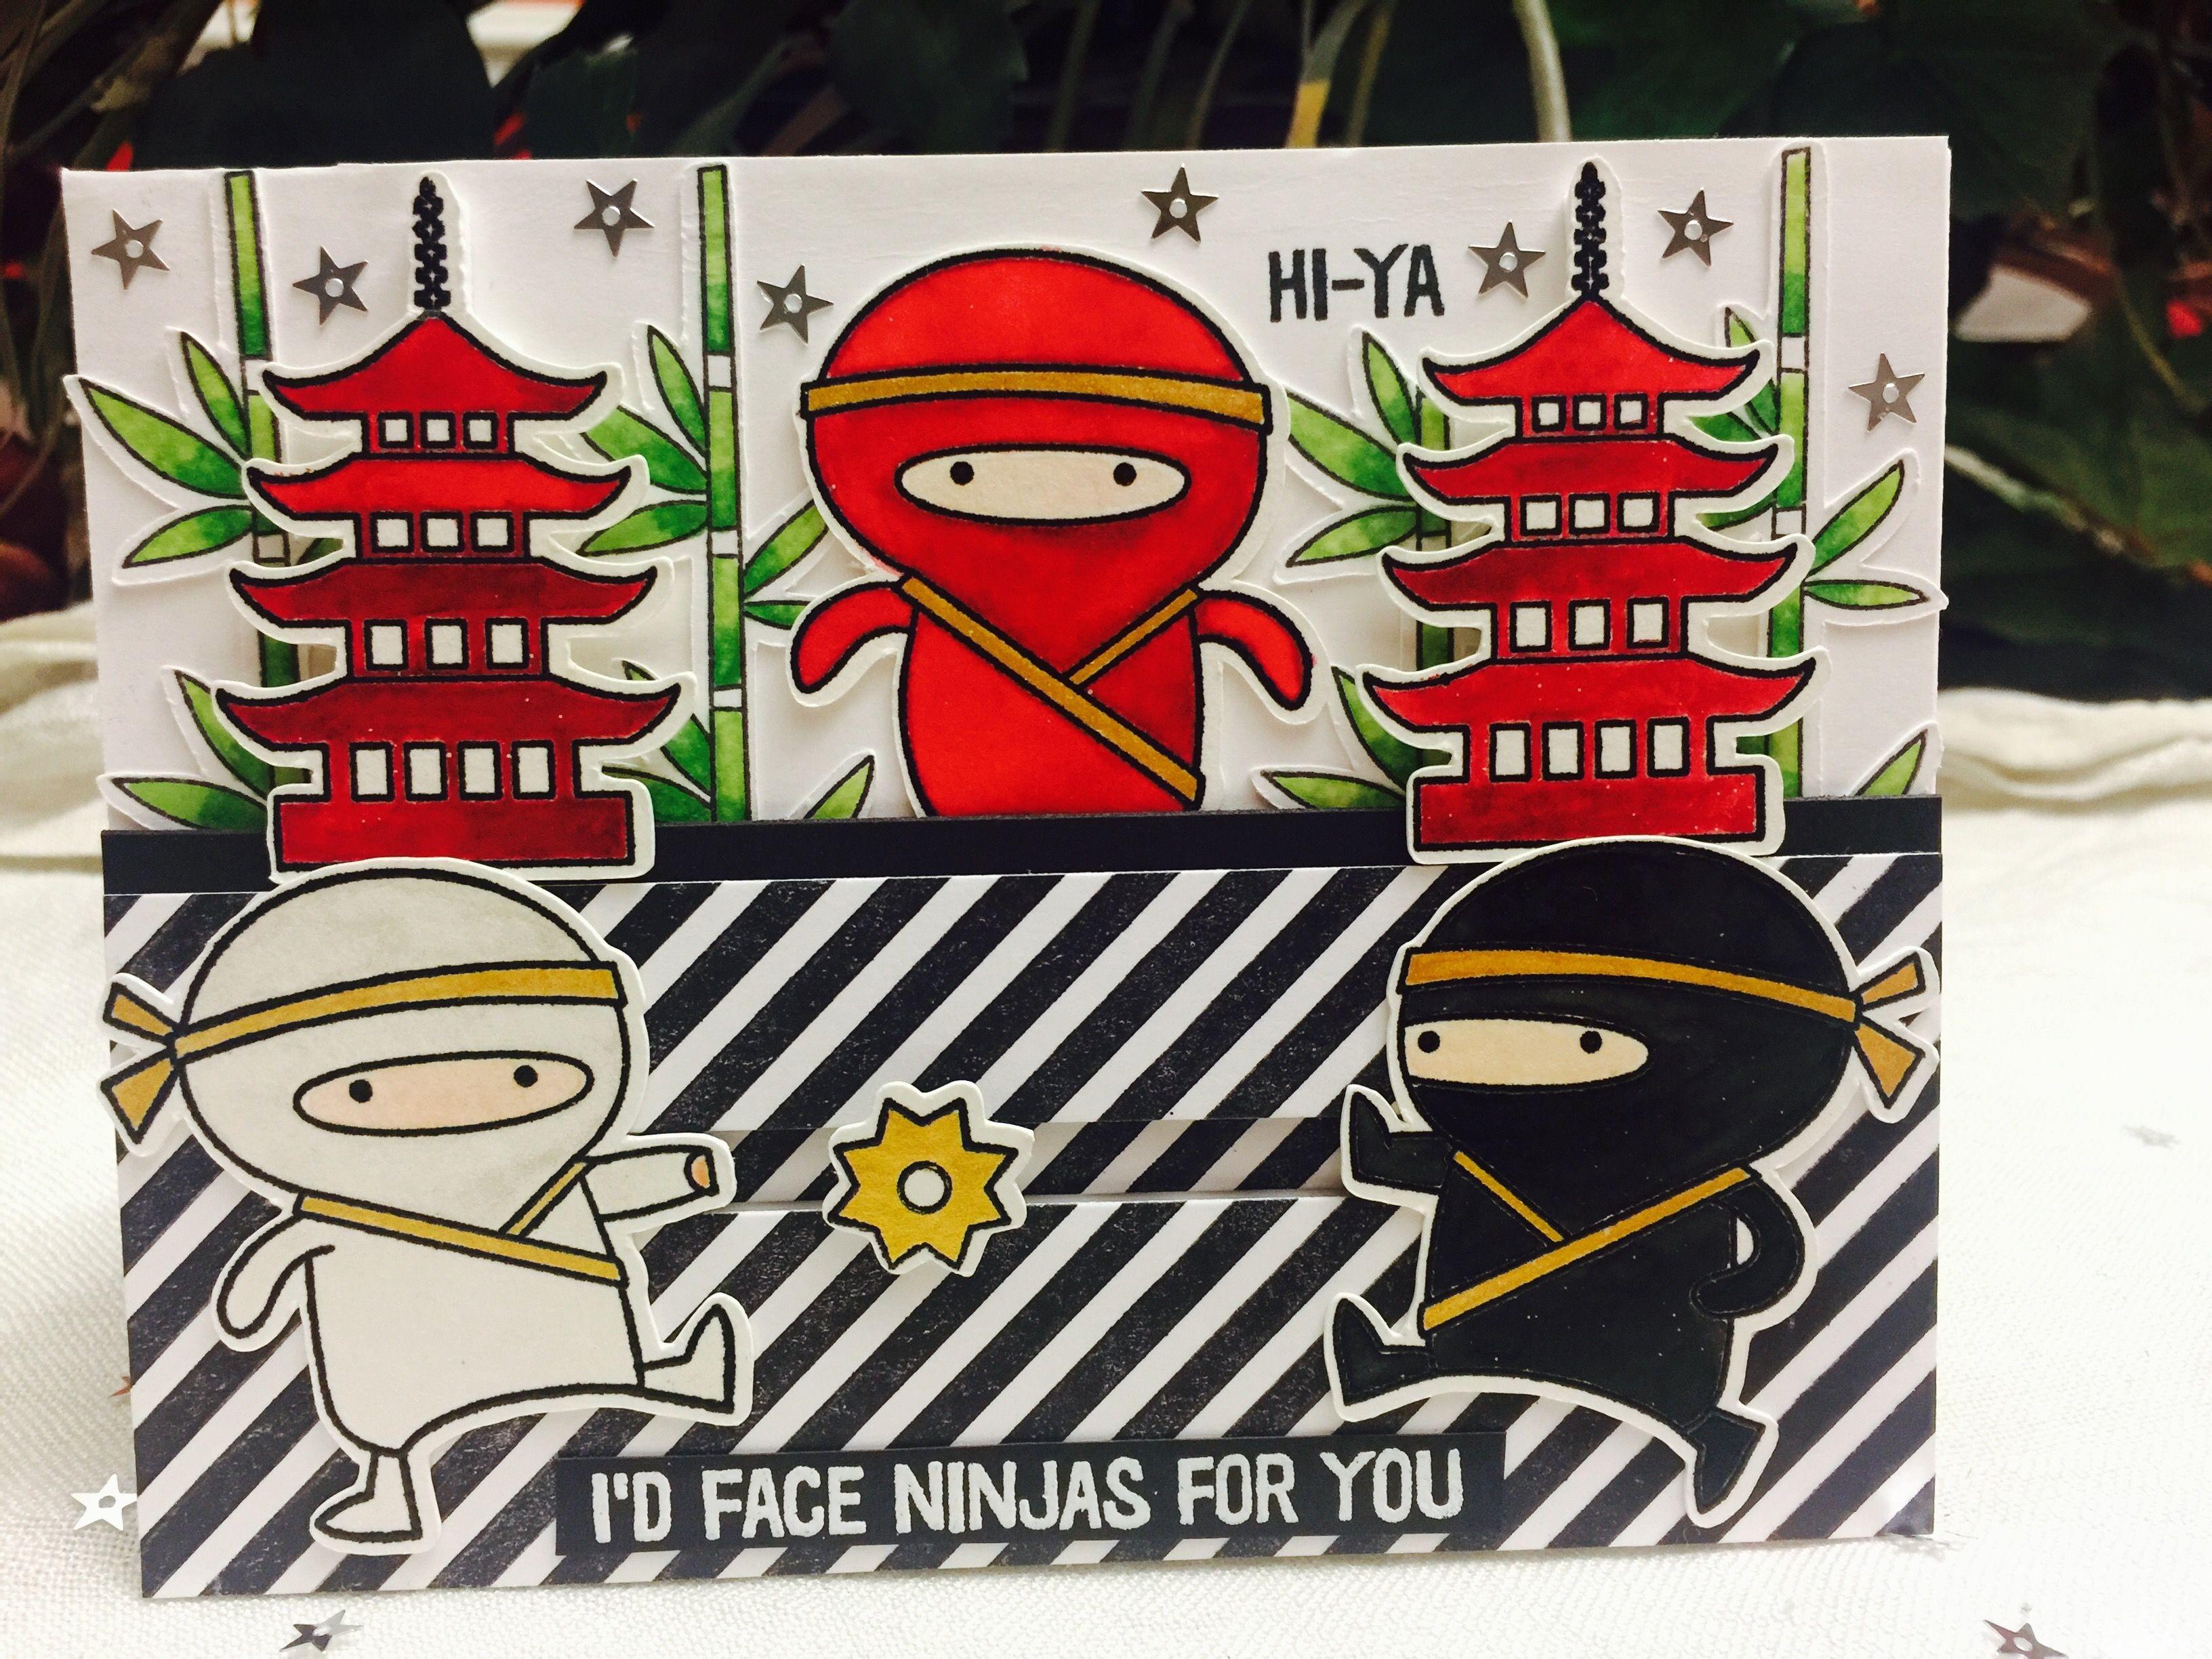 Ninja Papercraft Mft Ninja Mazing Paper Crafting Cards asia